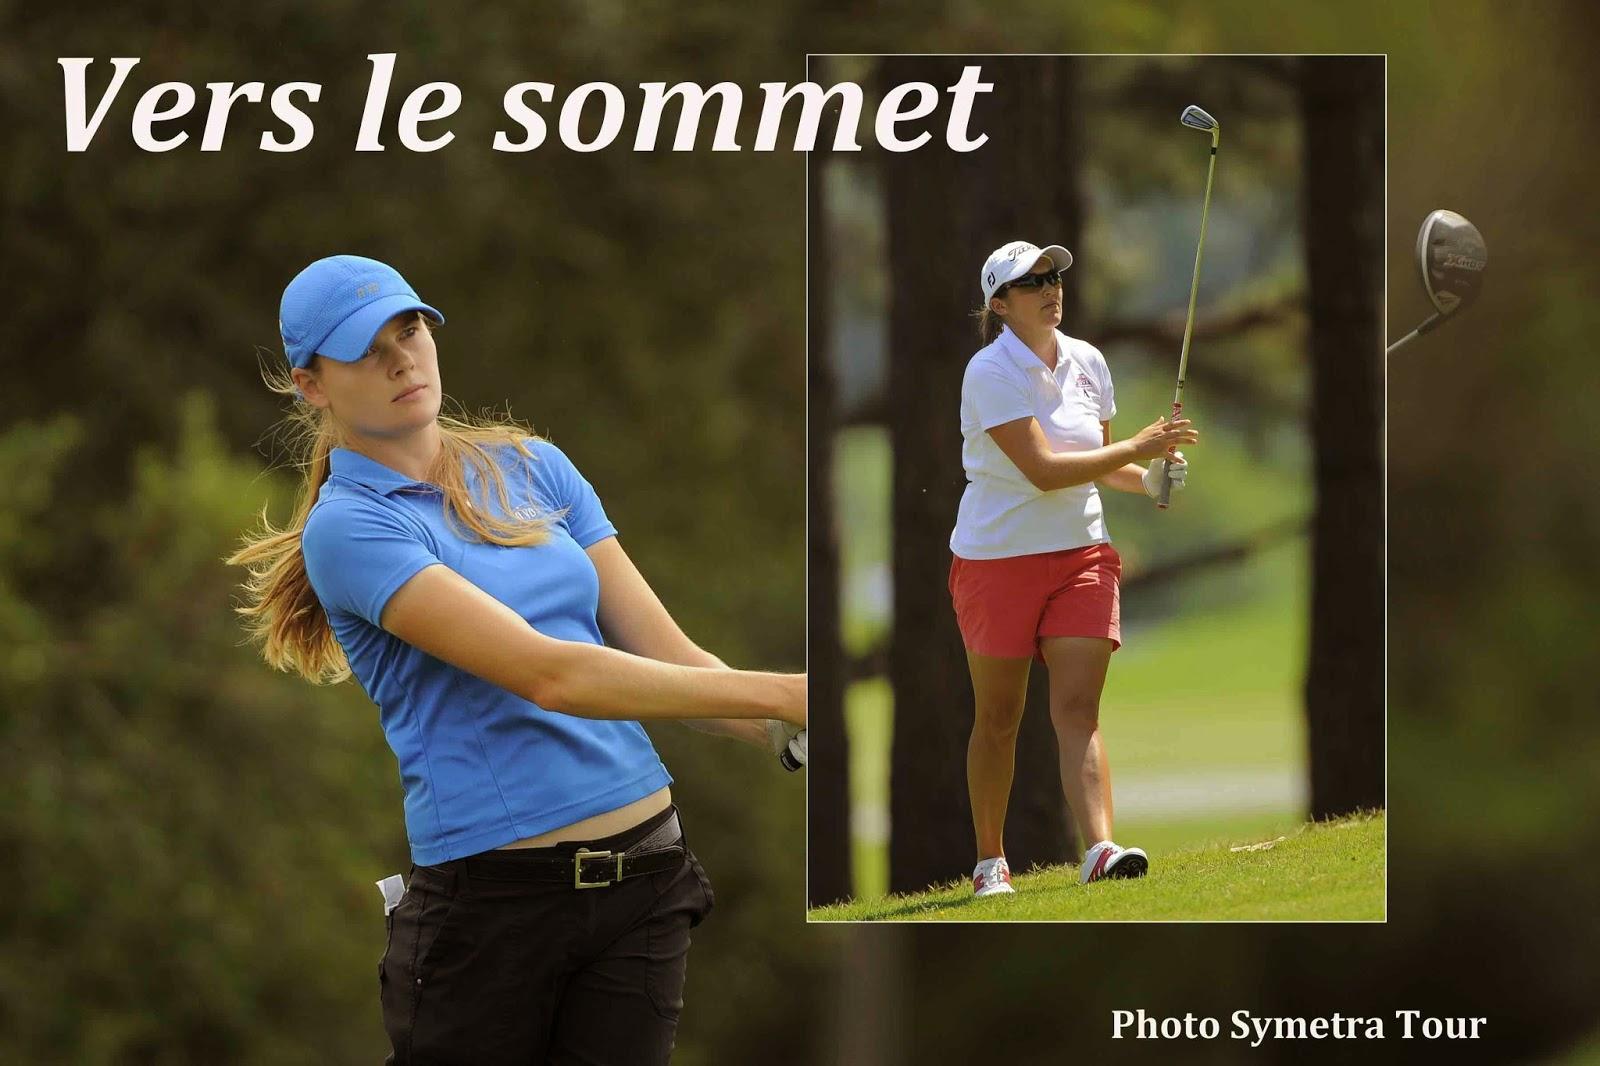 Vers le sommet. Qualifications LPGA 2014 – 1